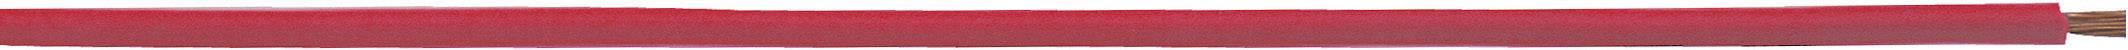 Opletenie / lanko LappKabel 4510053 H05V-K, 1 x 1 mm², vonkajší Ø 2.60 mm, 100 m, biela